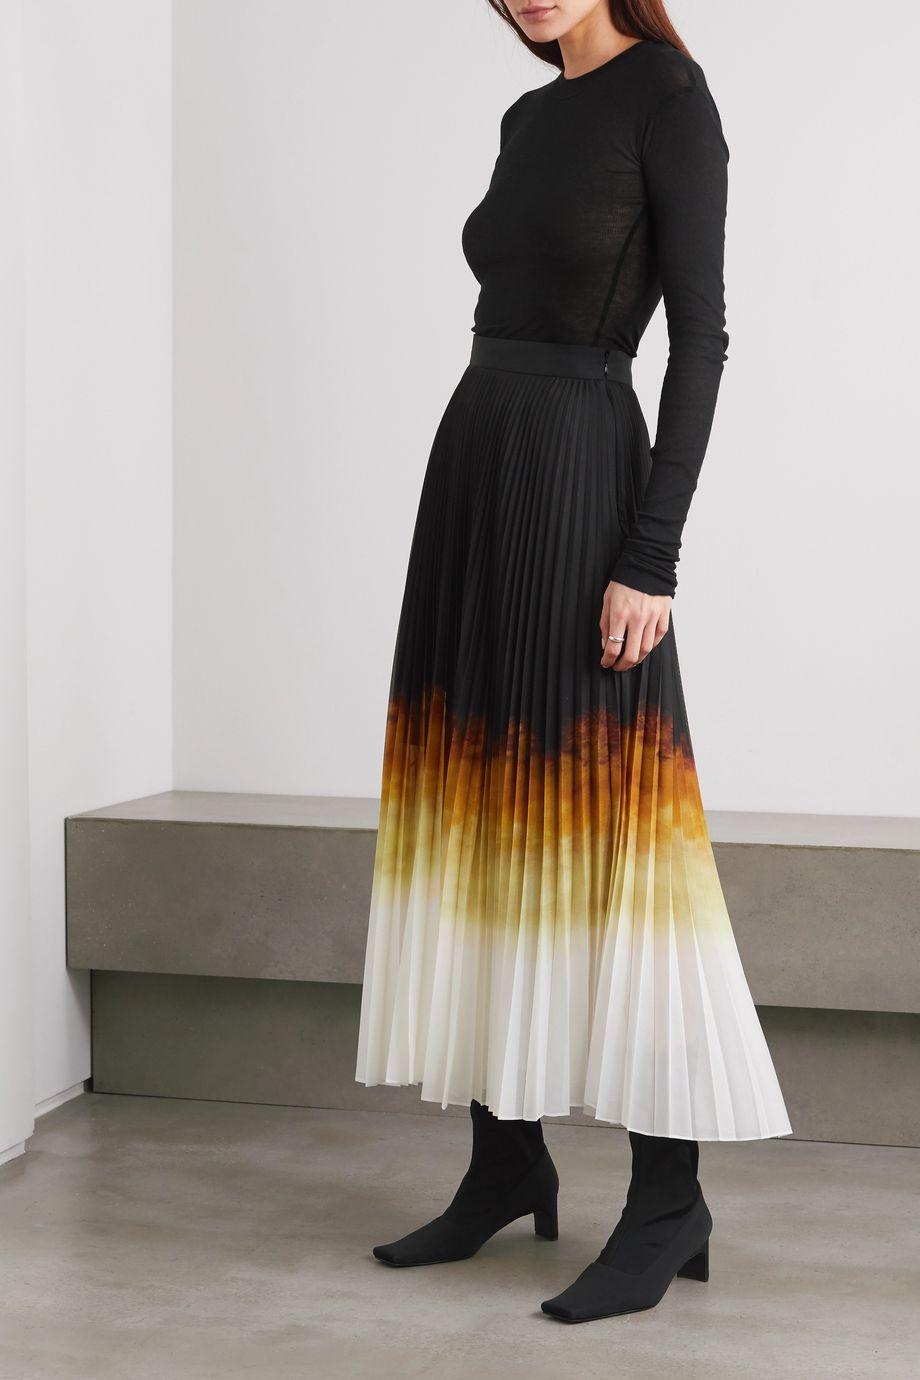 BITE Studios + NET SUSTAIN ombré plissé-chiffon midi skirt